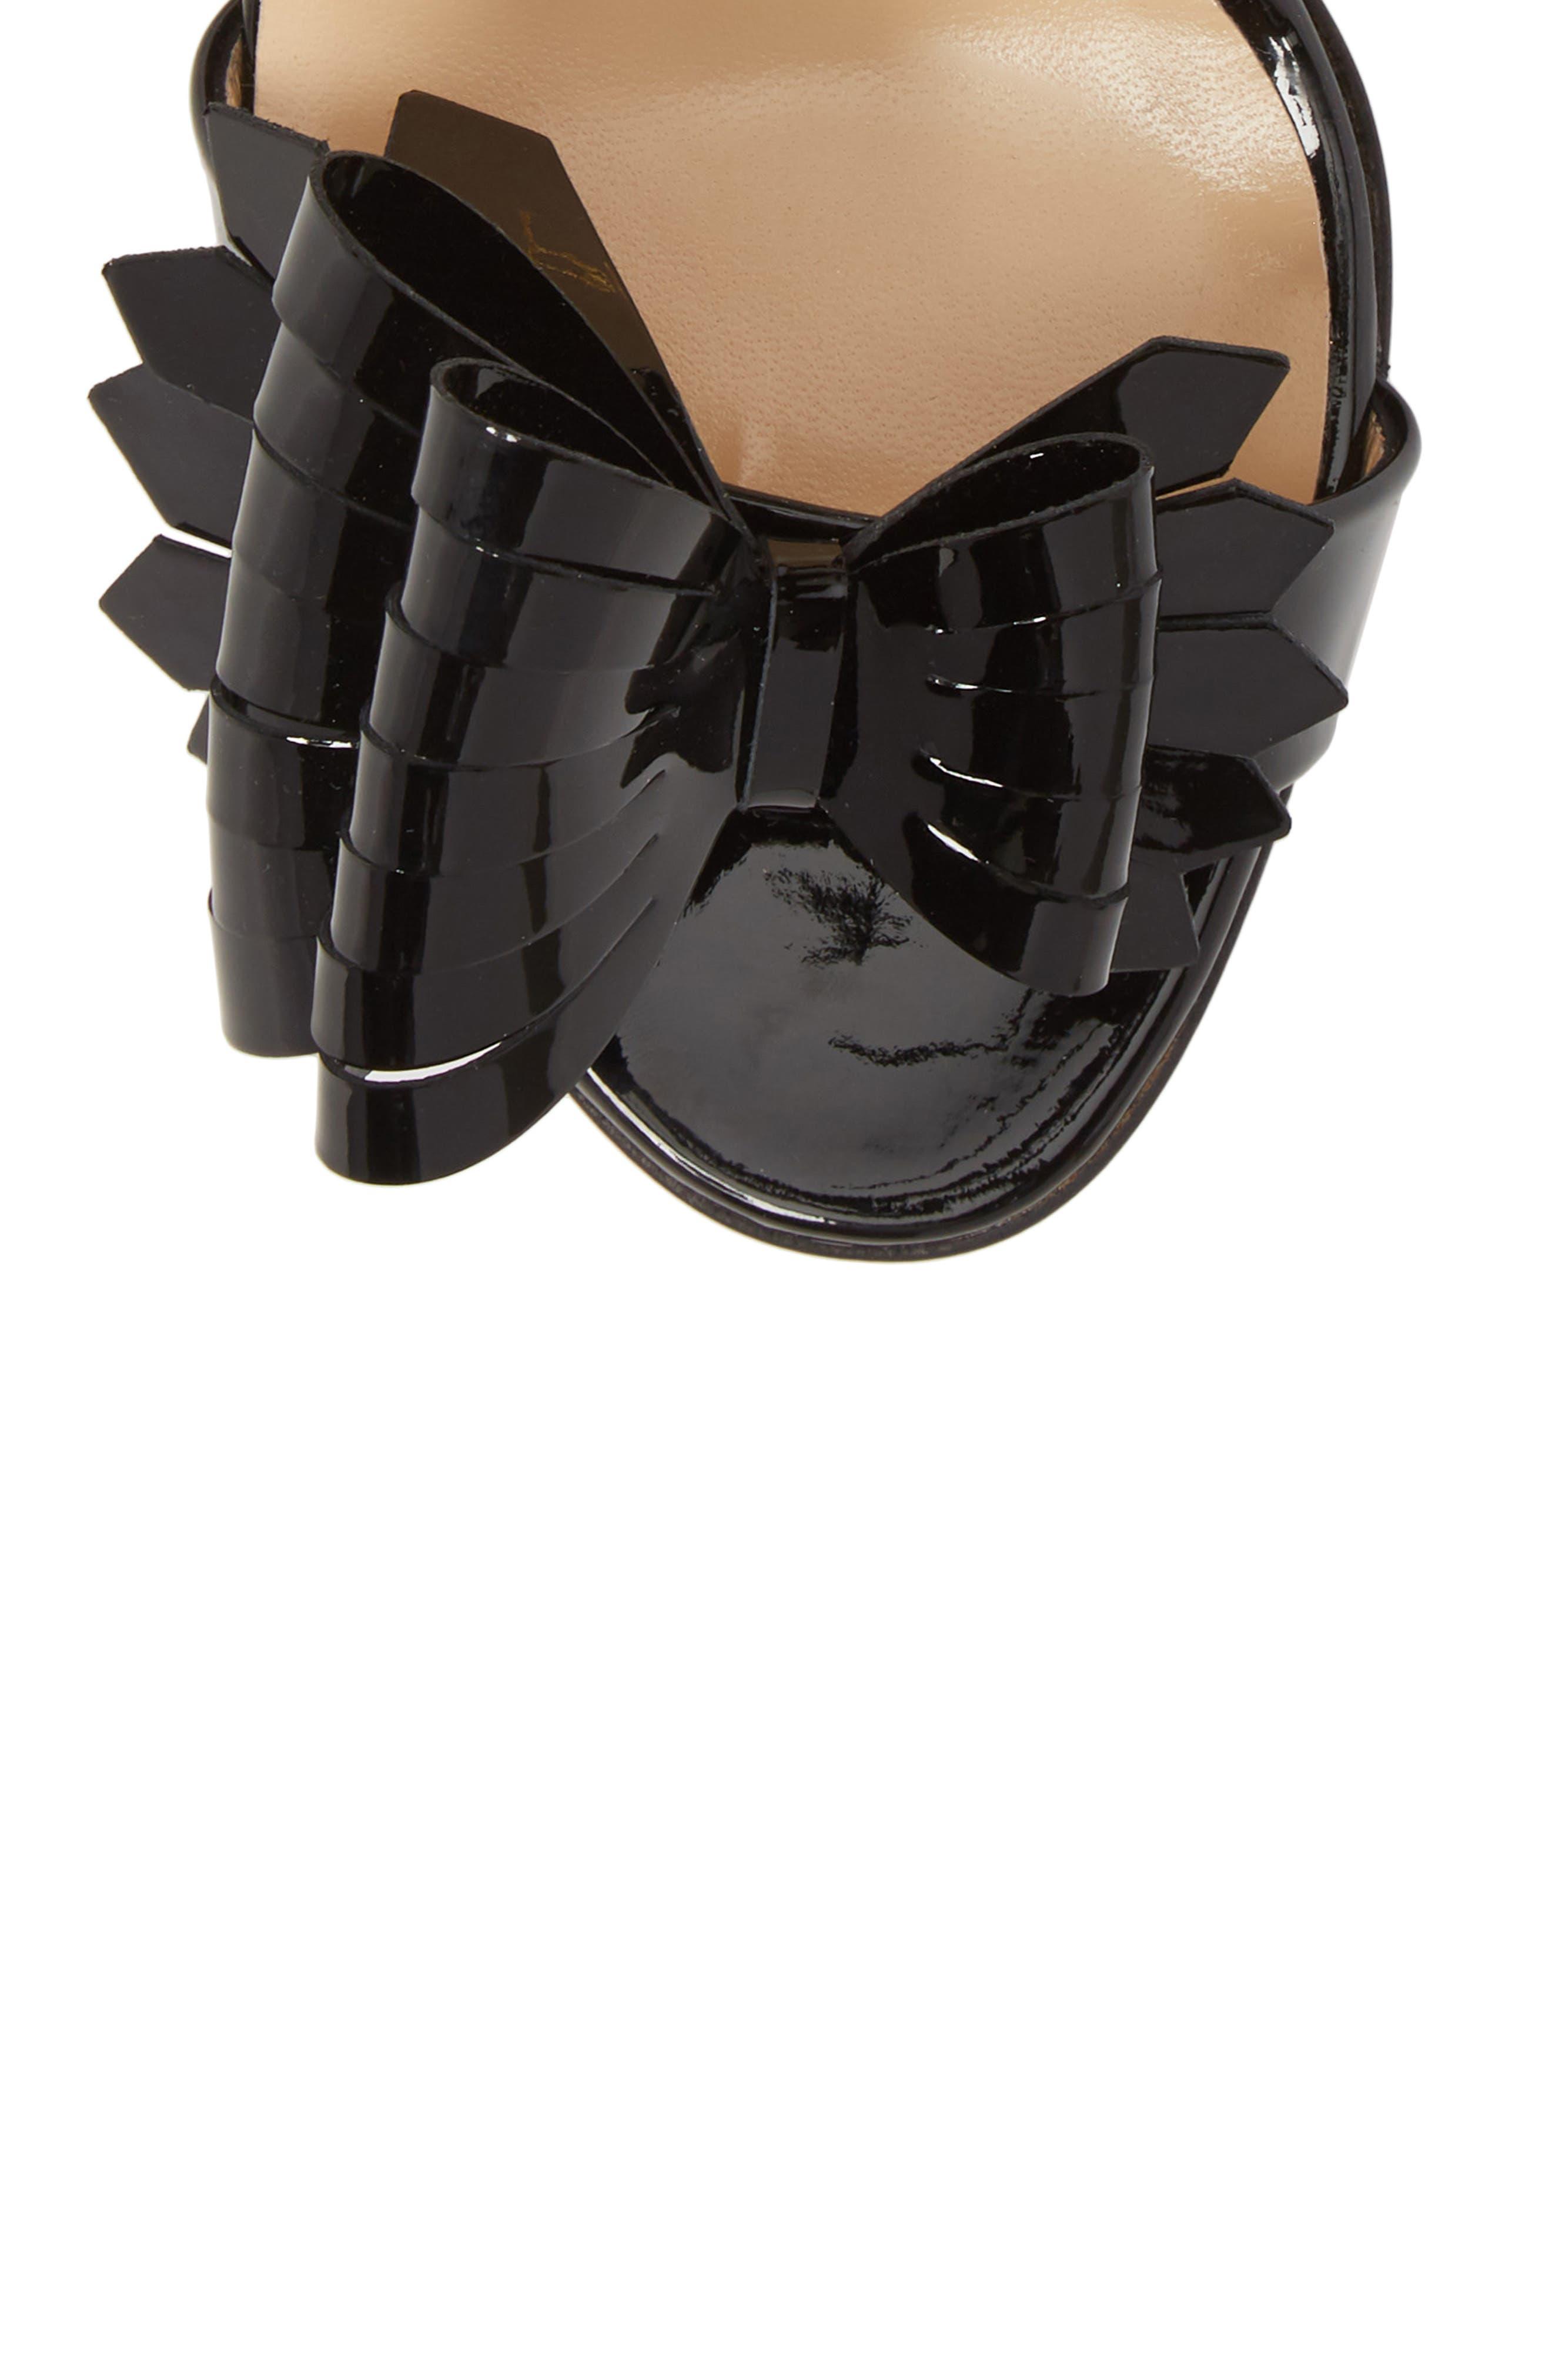 Miss Valois Bow Ankle Strap Sandal,                             Alternate thumbnail 9, color,